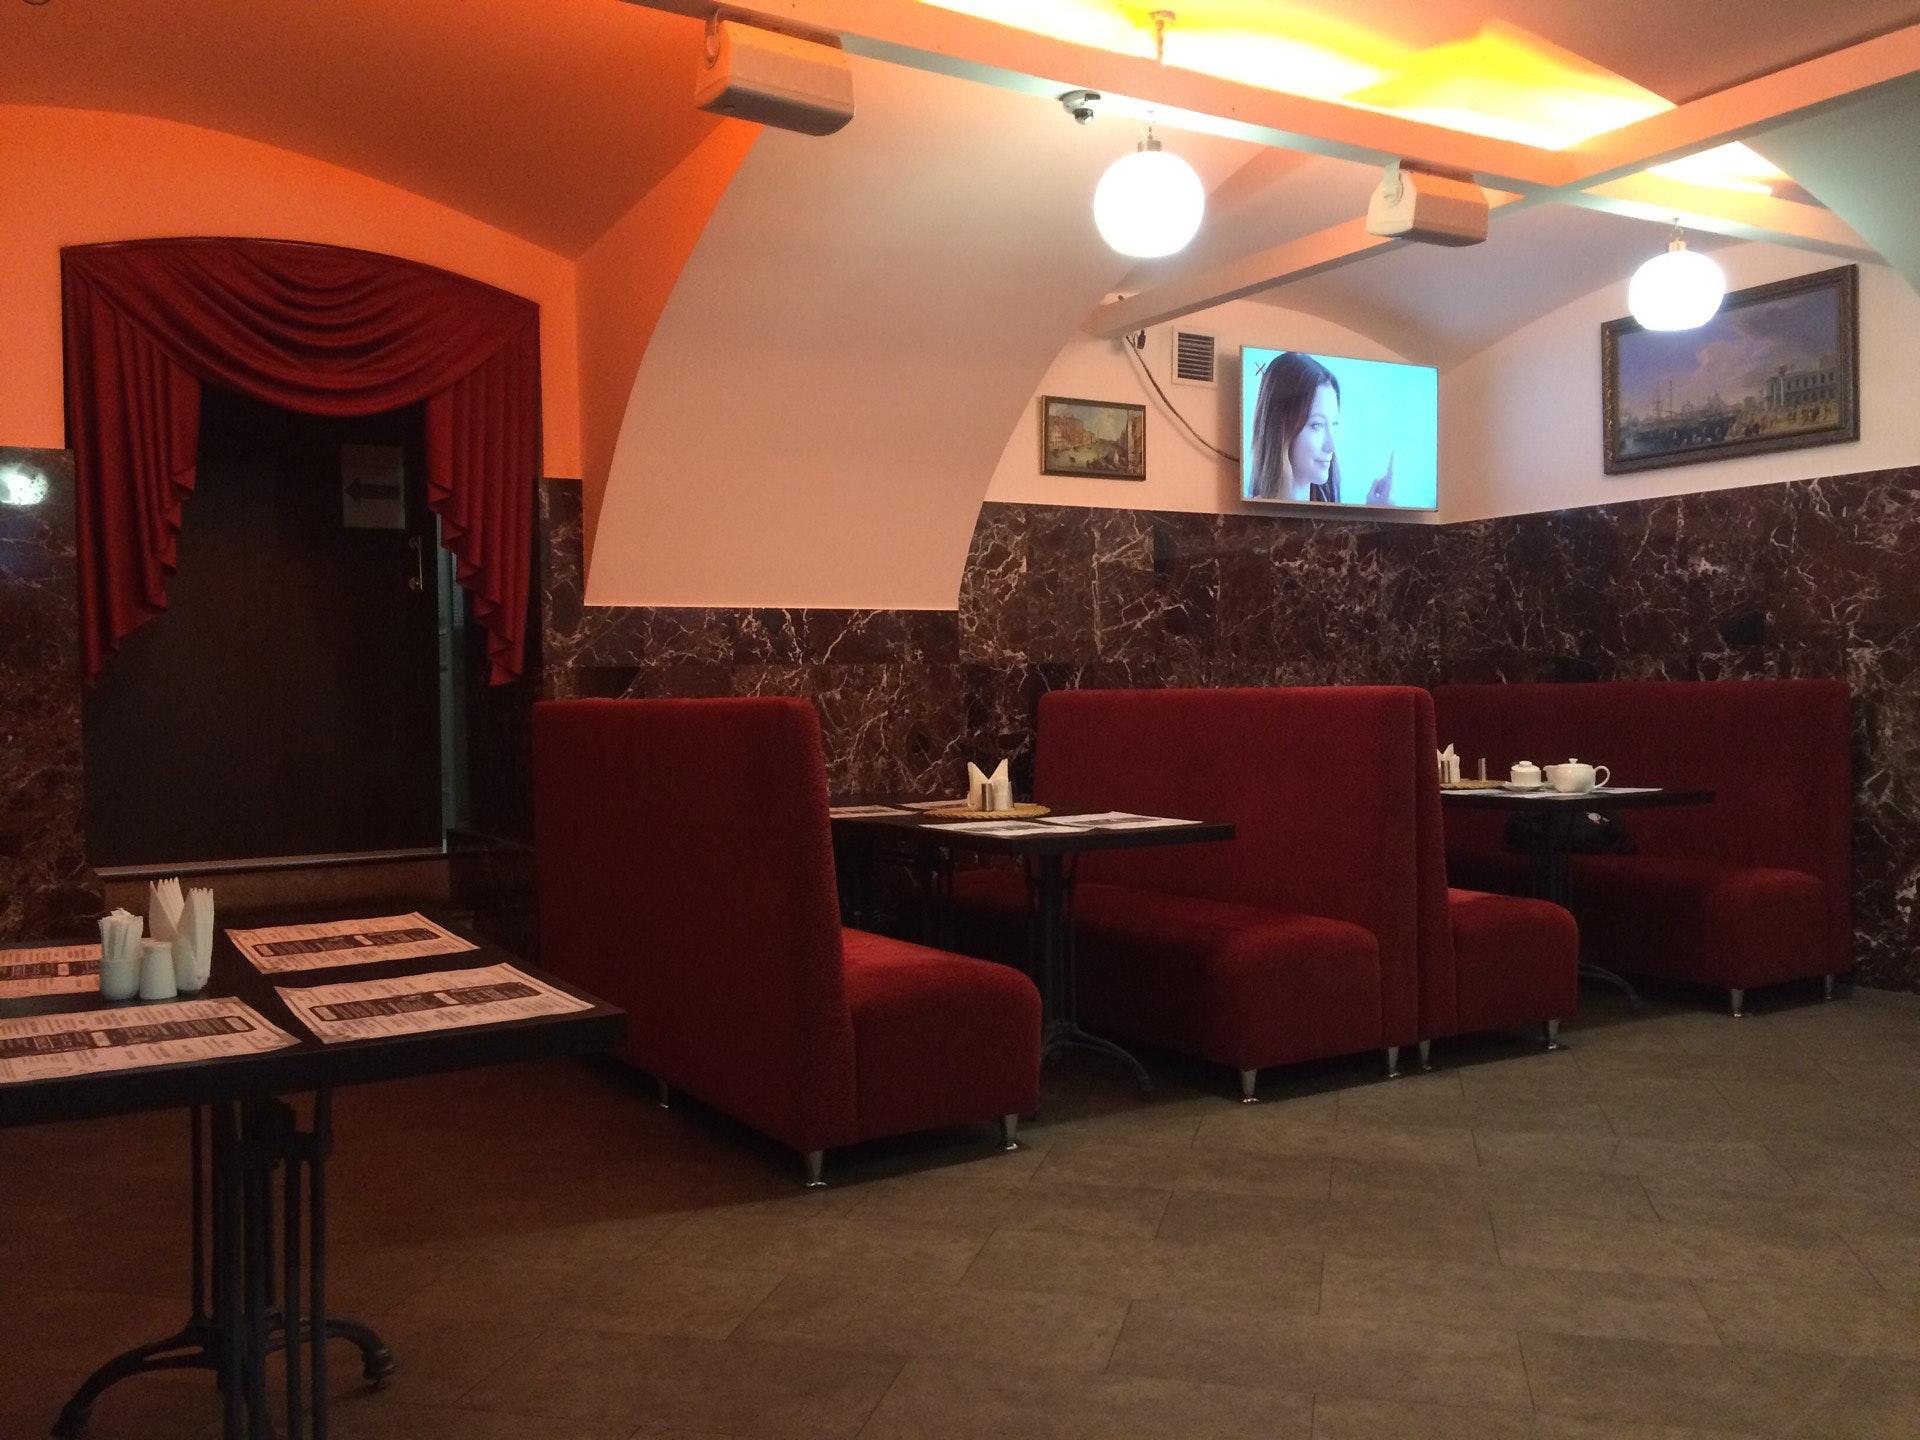 Ресторан рим в санкт-петербурге